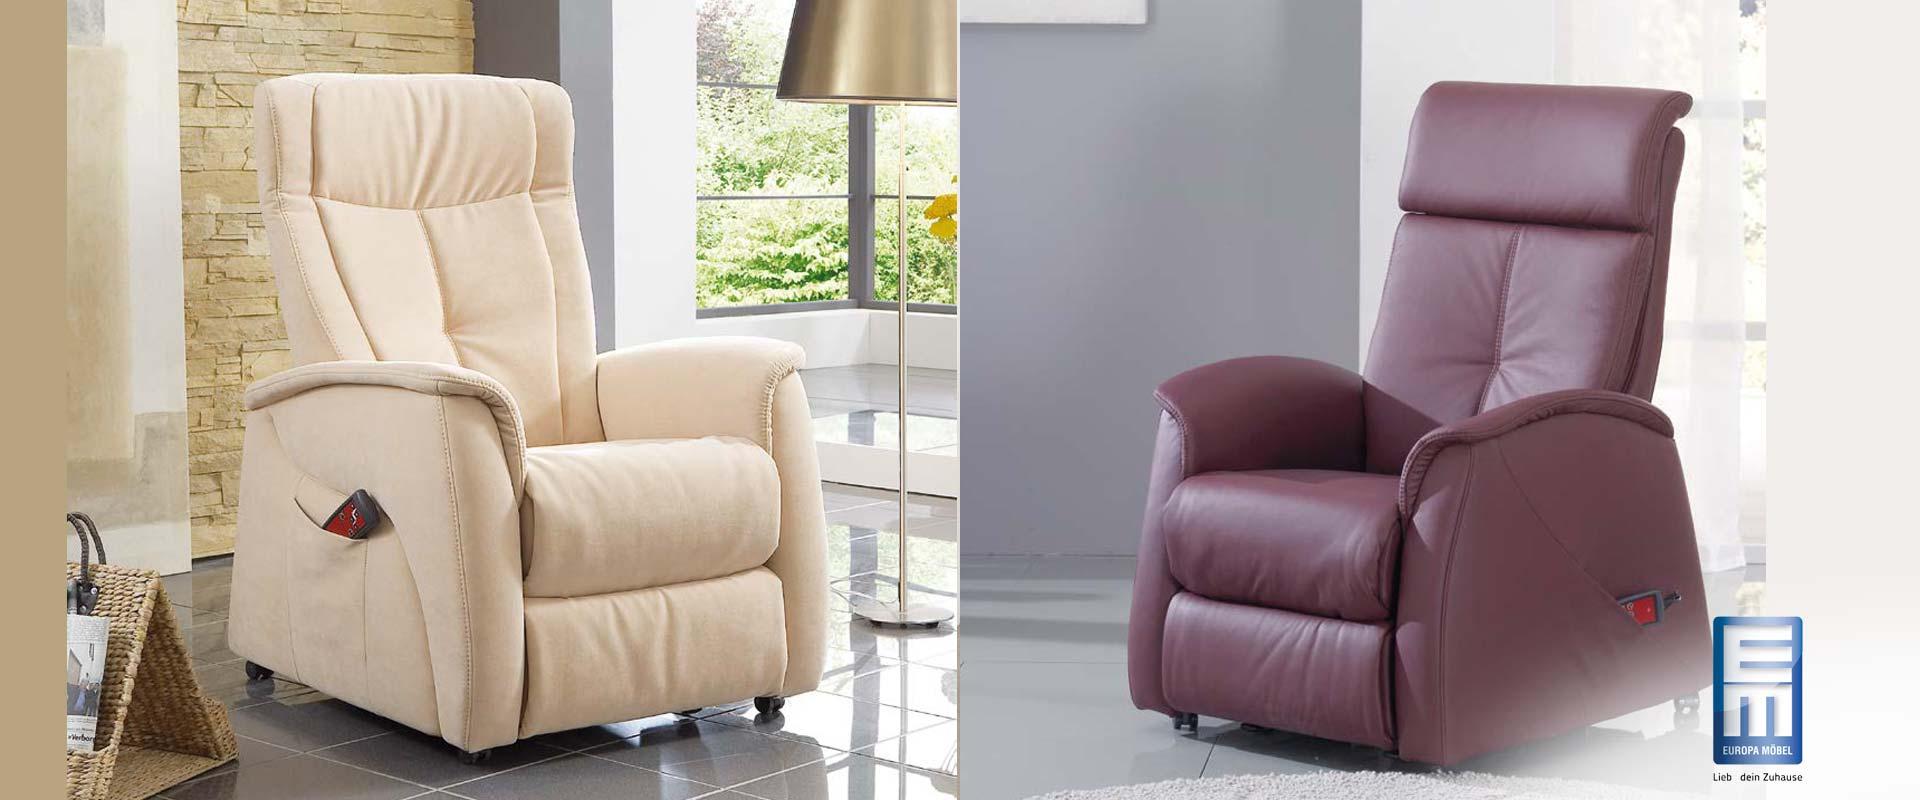 relaxsessel europa m bel in berlin domeyer m bel und k chen. Black Bedroom Furniture Sets. Home Design Ideas